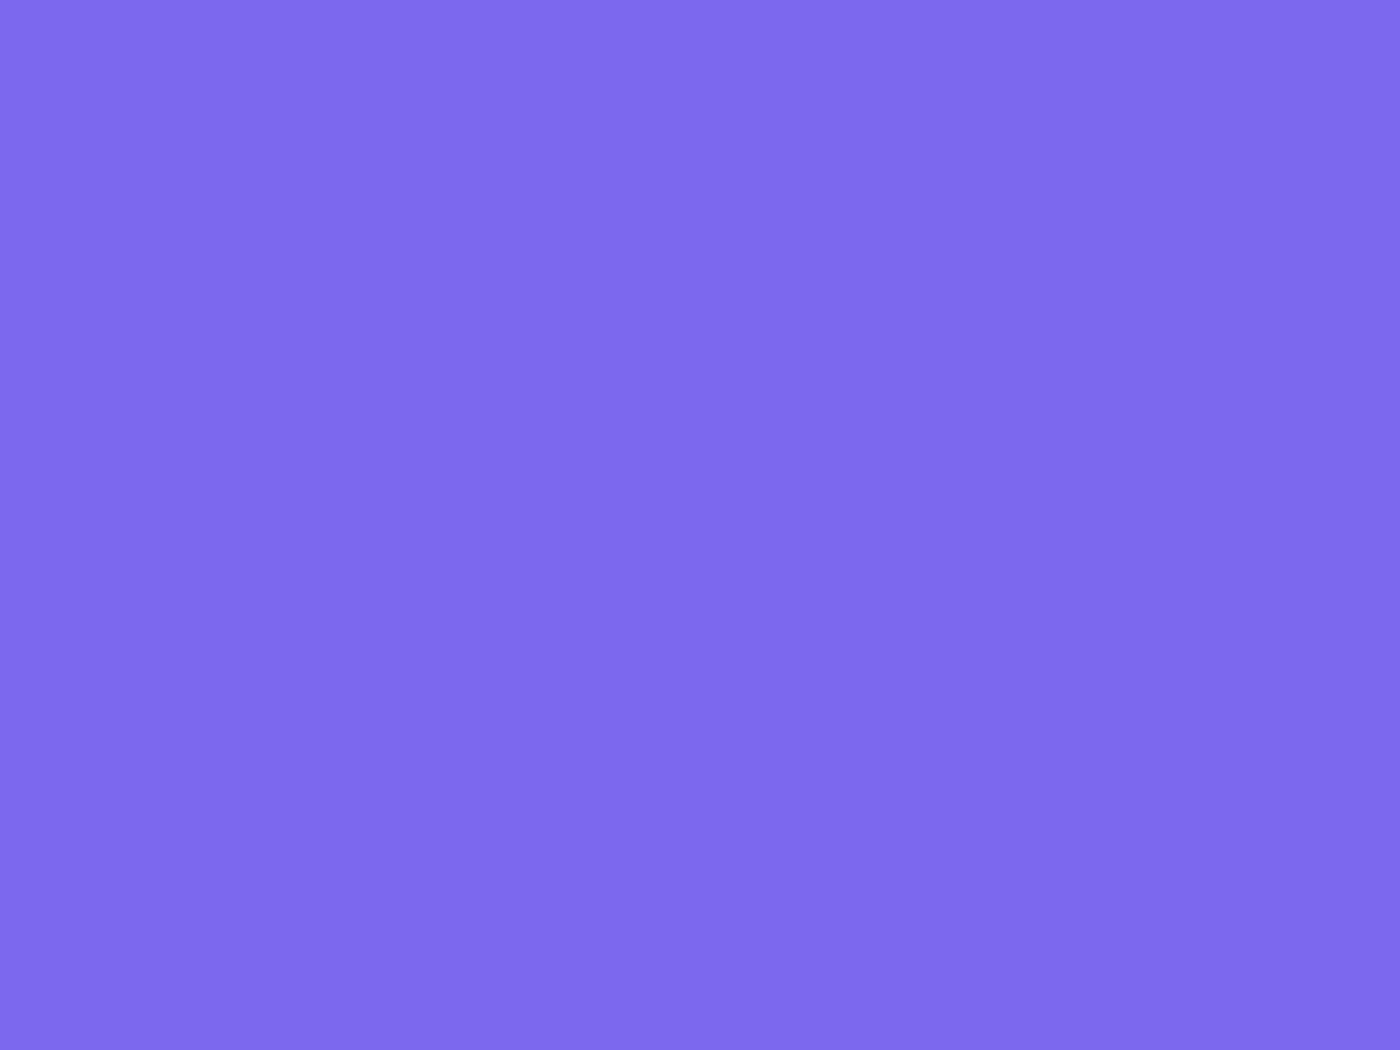 1400x1050 Medium Slate Blue Solid Color Background